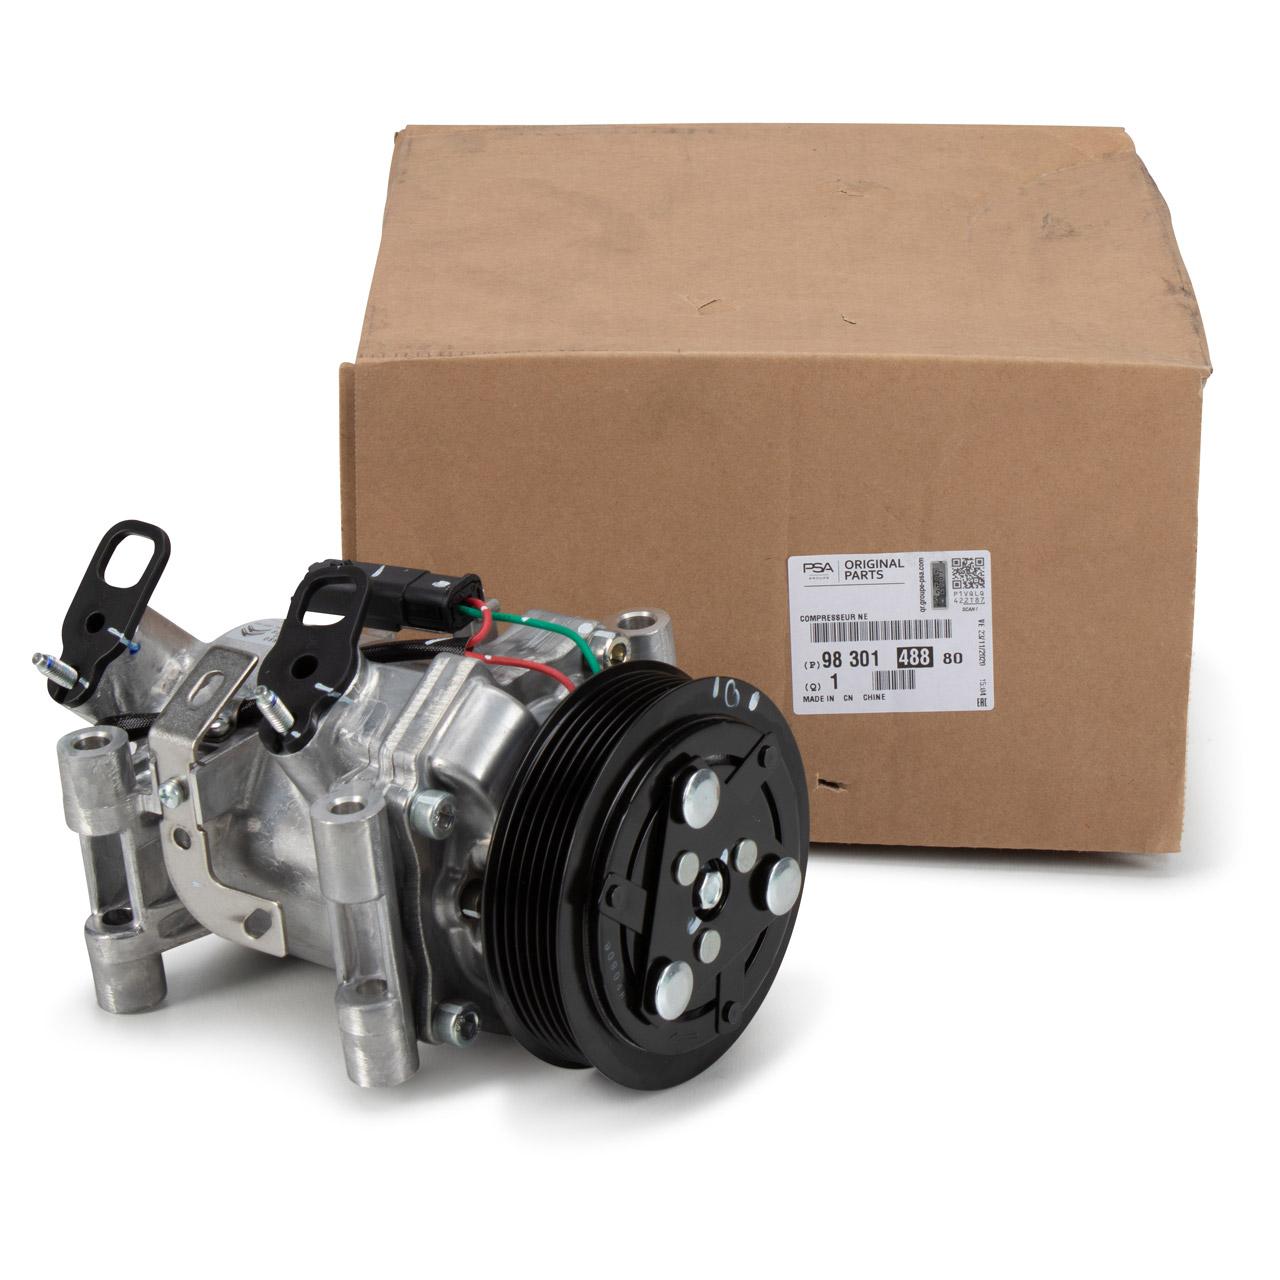 ORIGINAL PSA Kompressor Klimaanlage C3 3 Jumpy Expert (V_) 9830148880